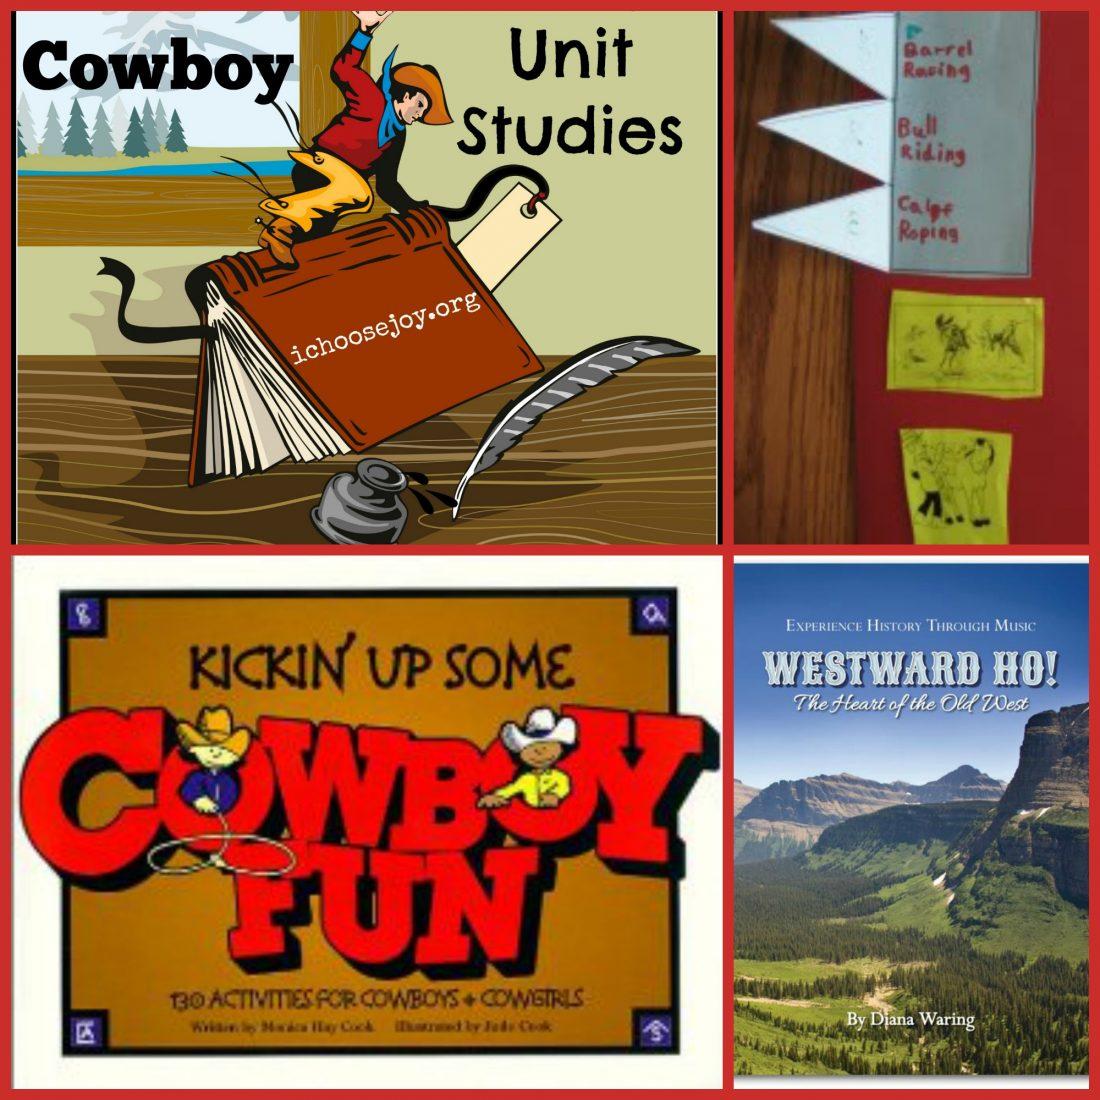 Cowboy lapbook and unit study